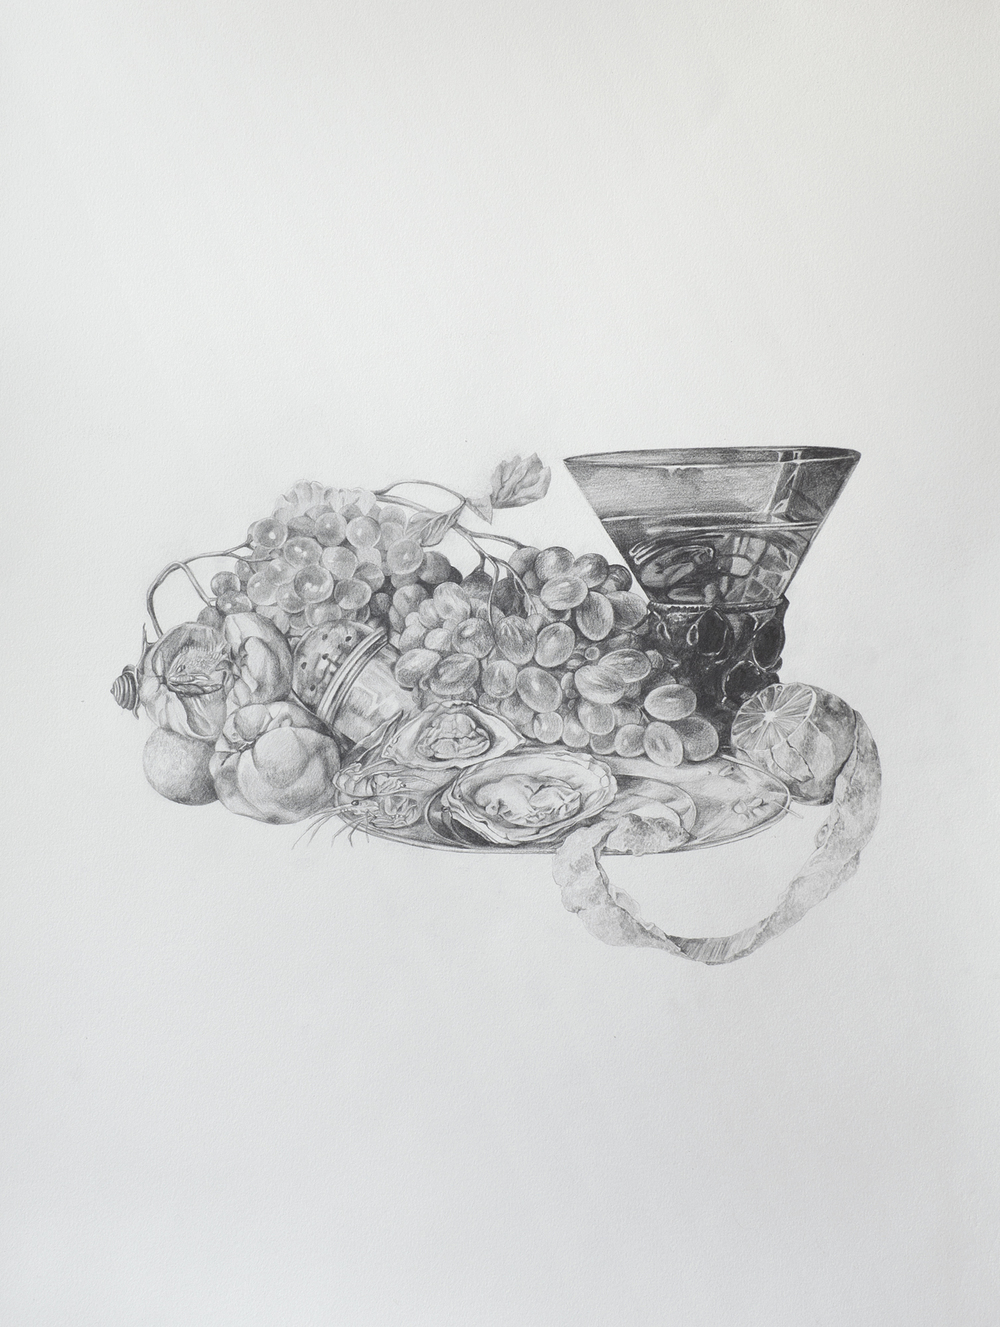 Untitled #248